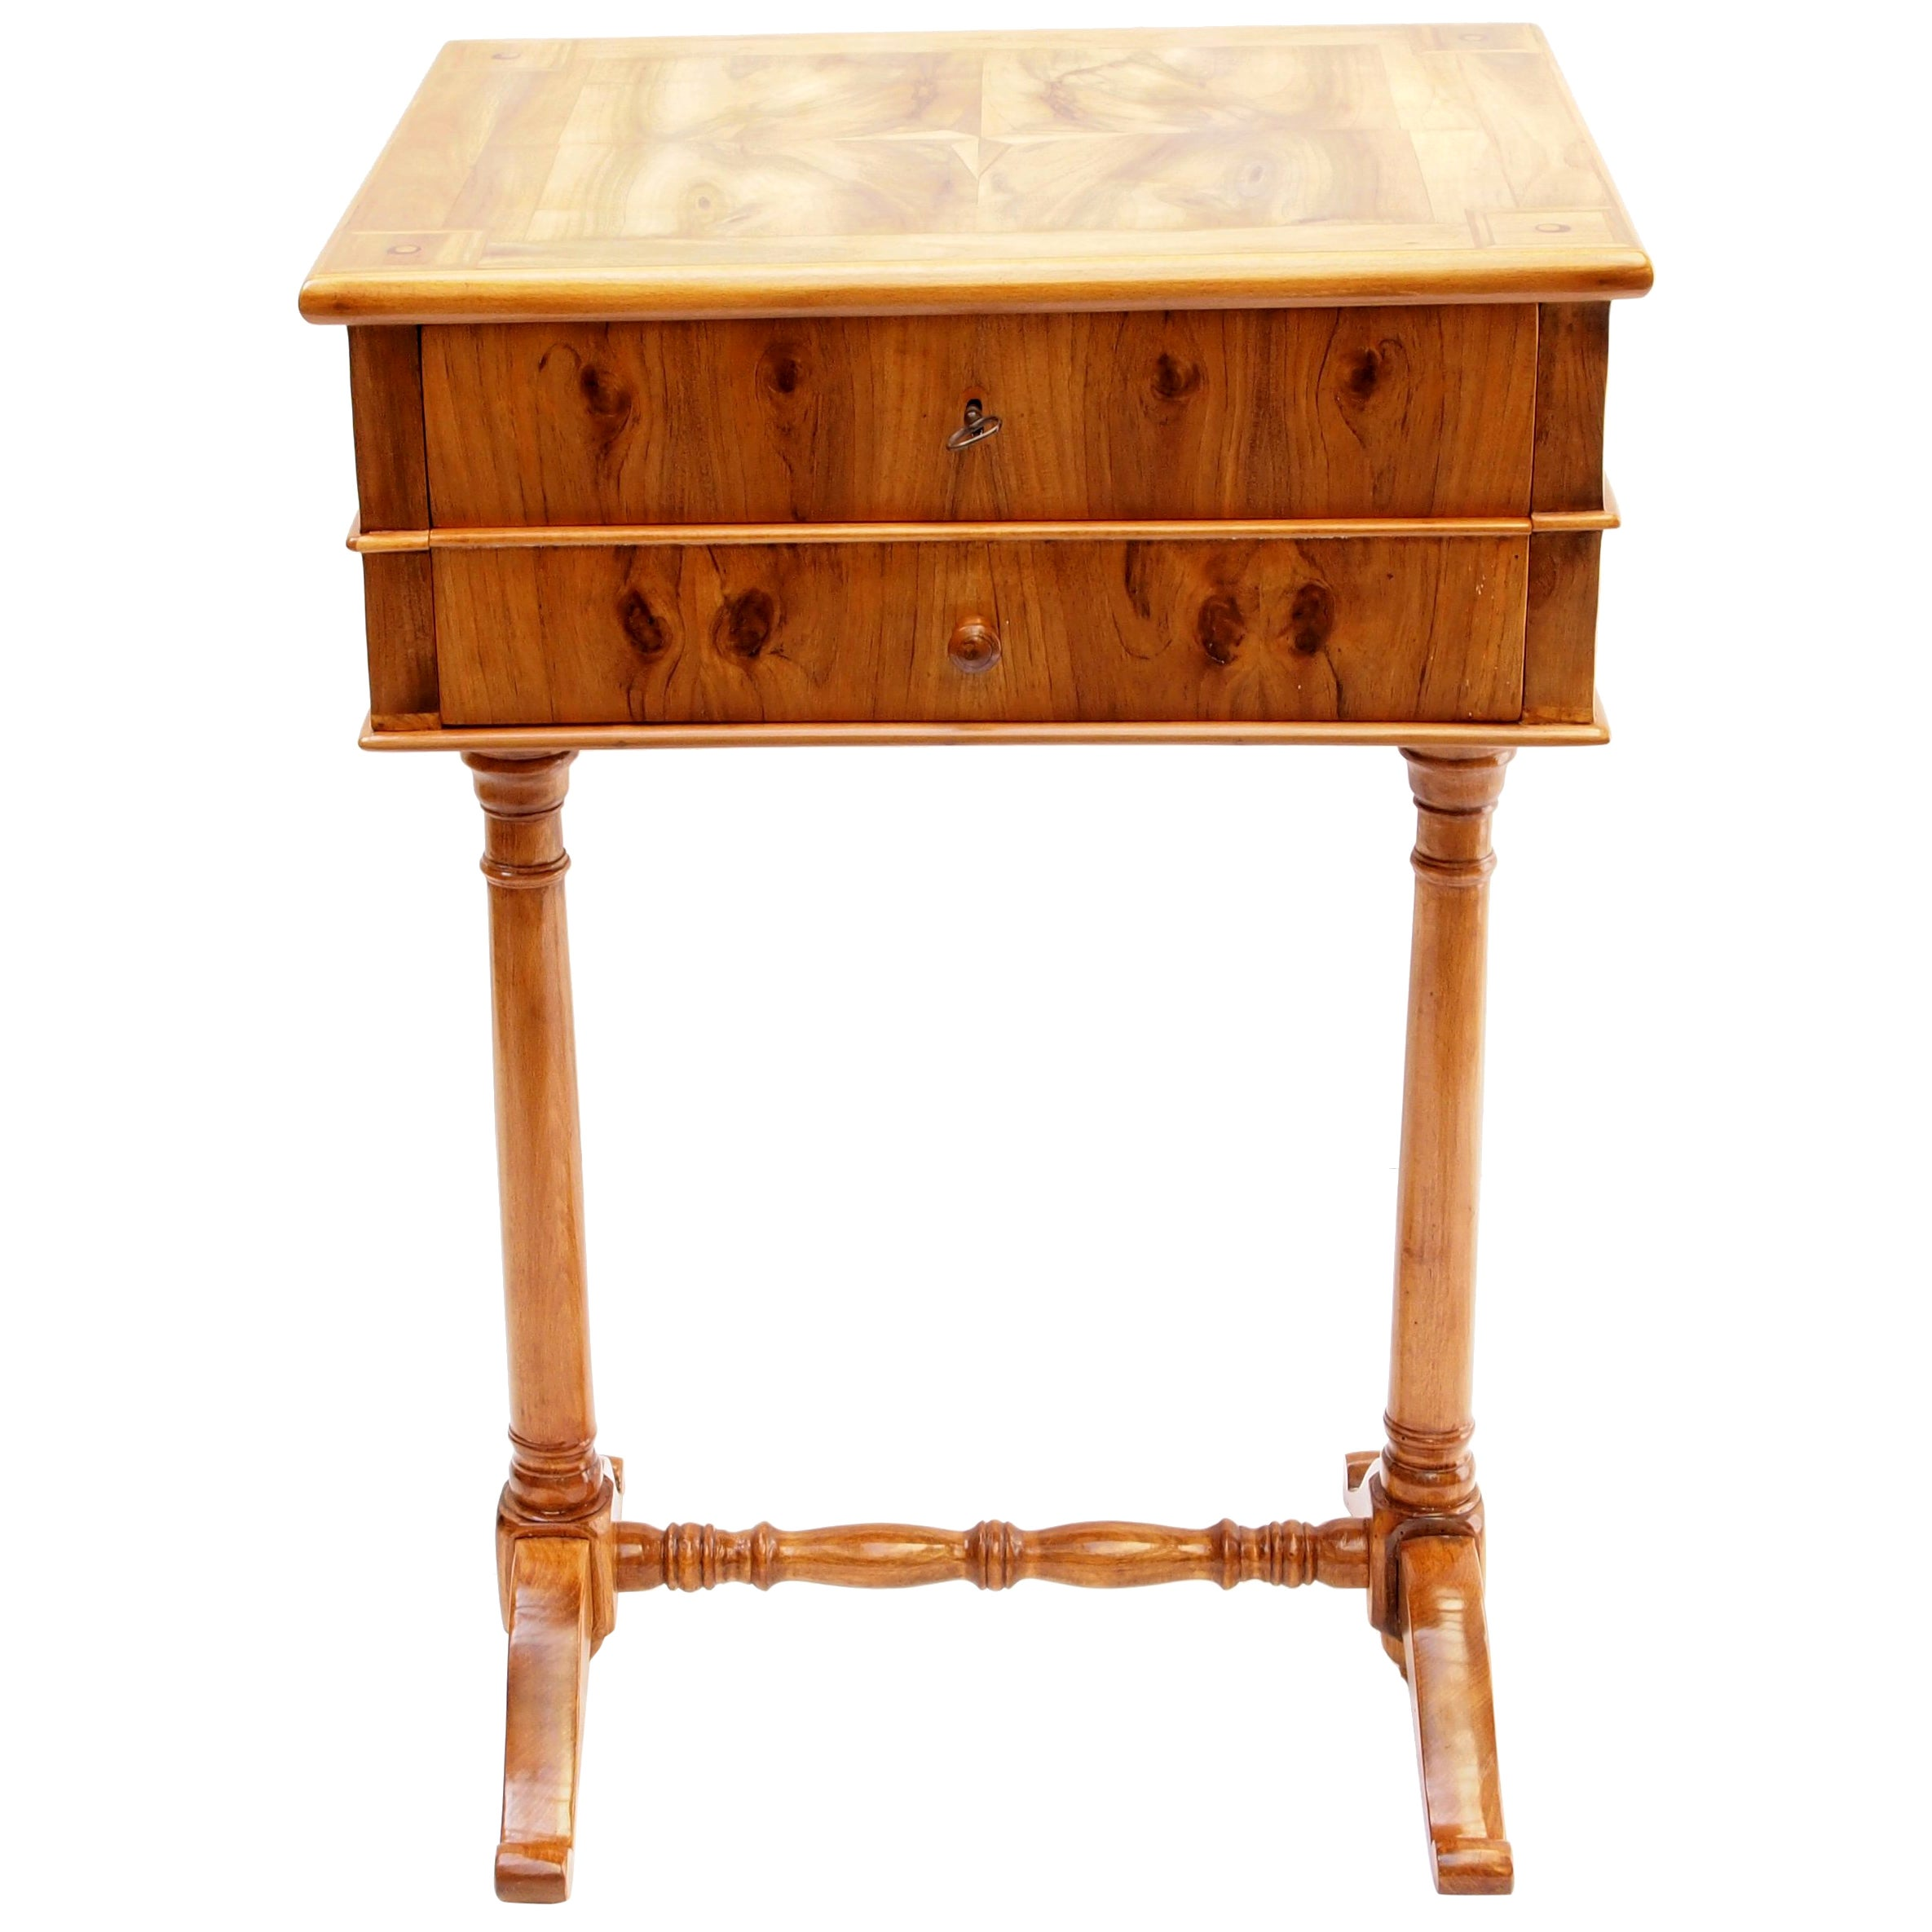 19th Century Biedermeier Walnut Sewing Table from Germany